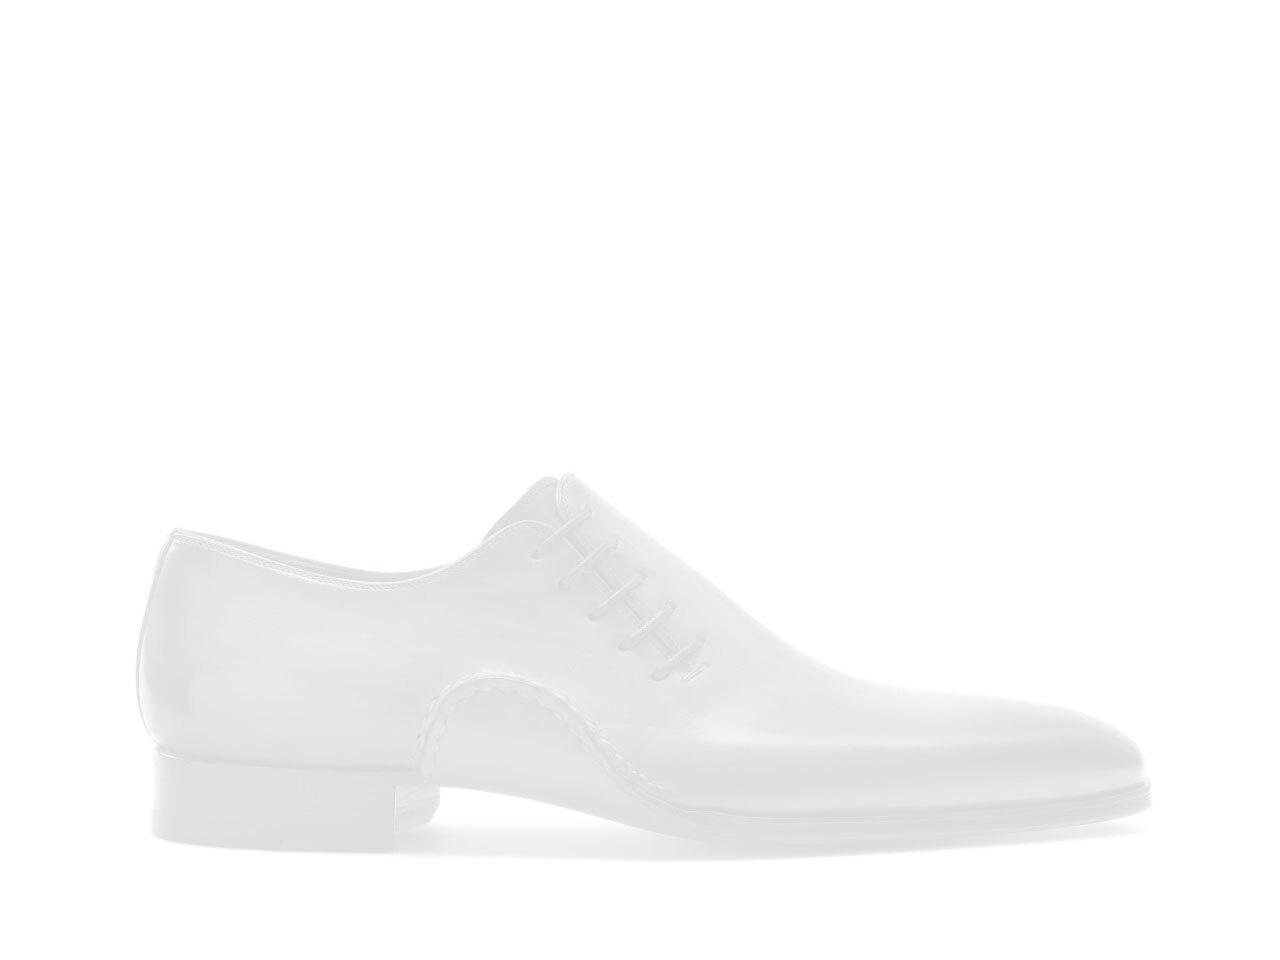 Pair of the Magnanni Playa Perf Grey Men's Sandal Slides